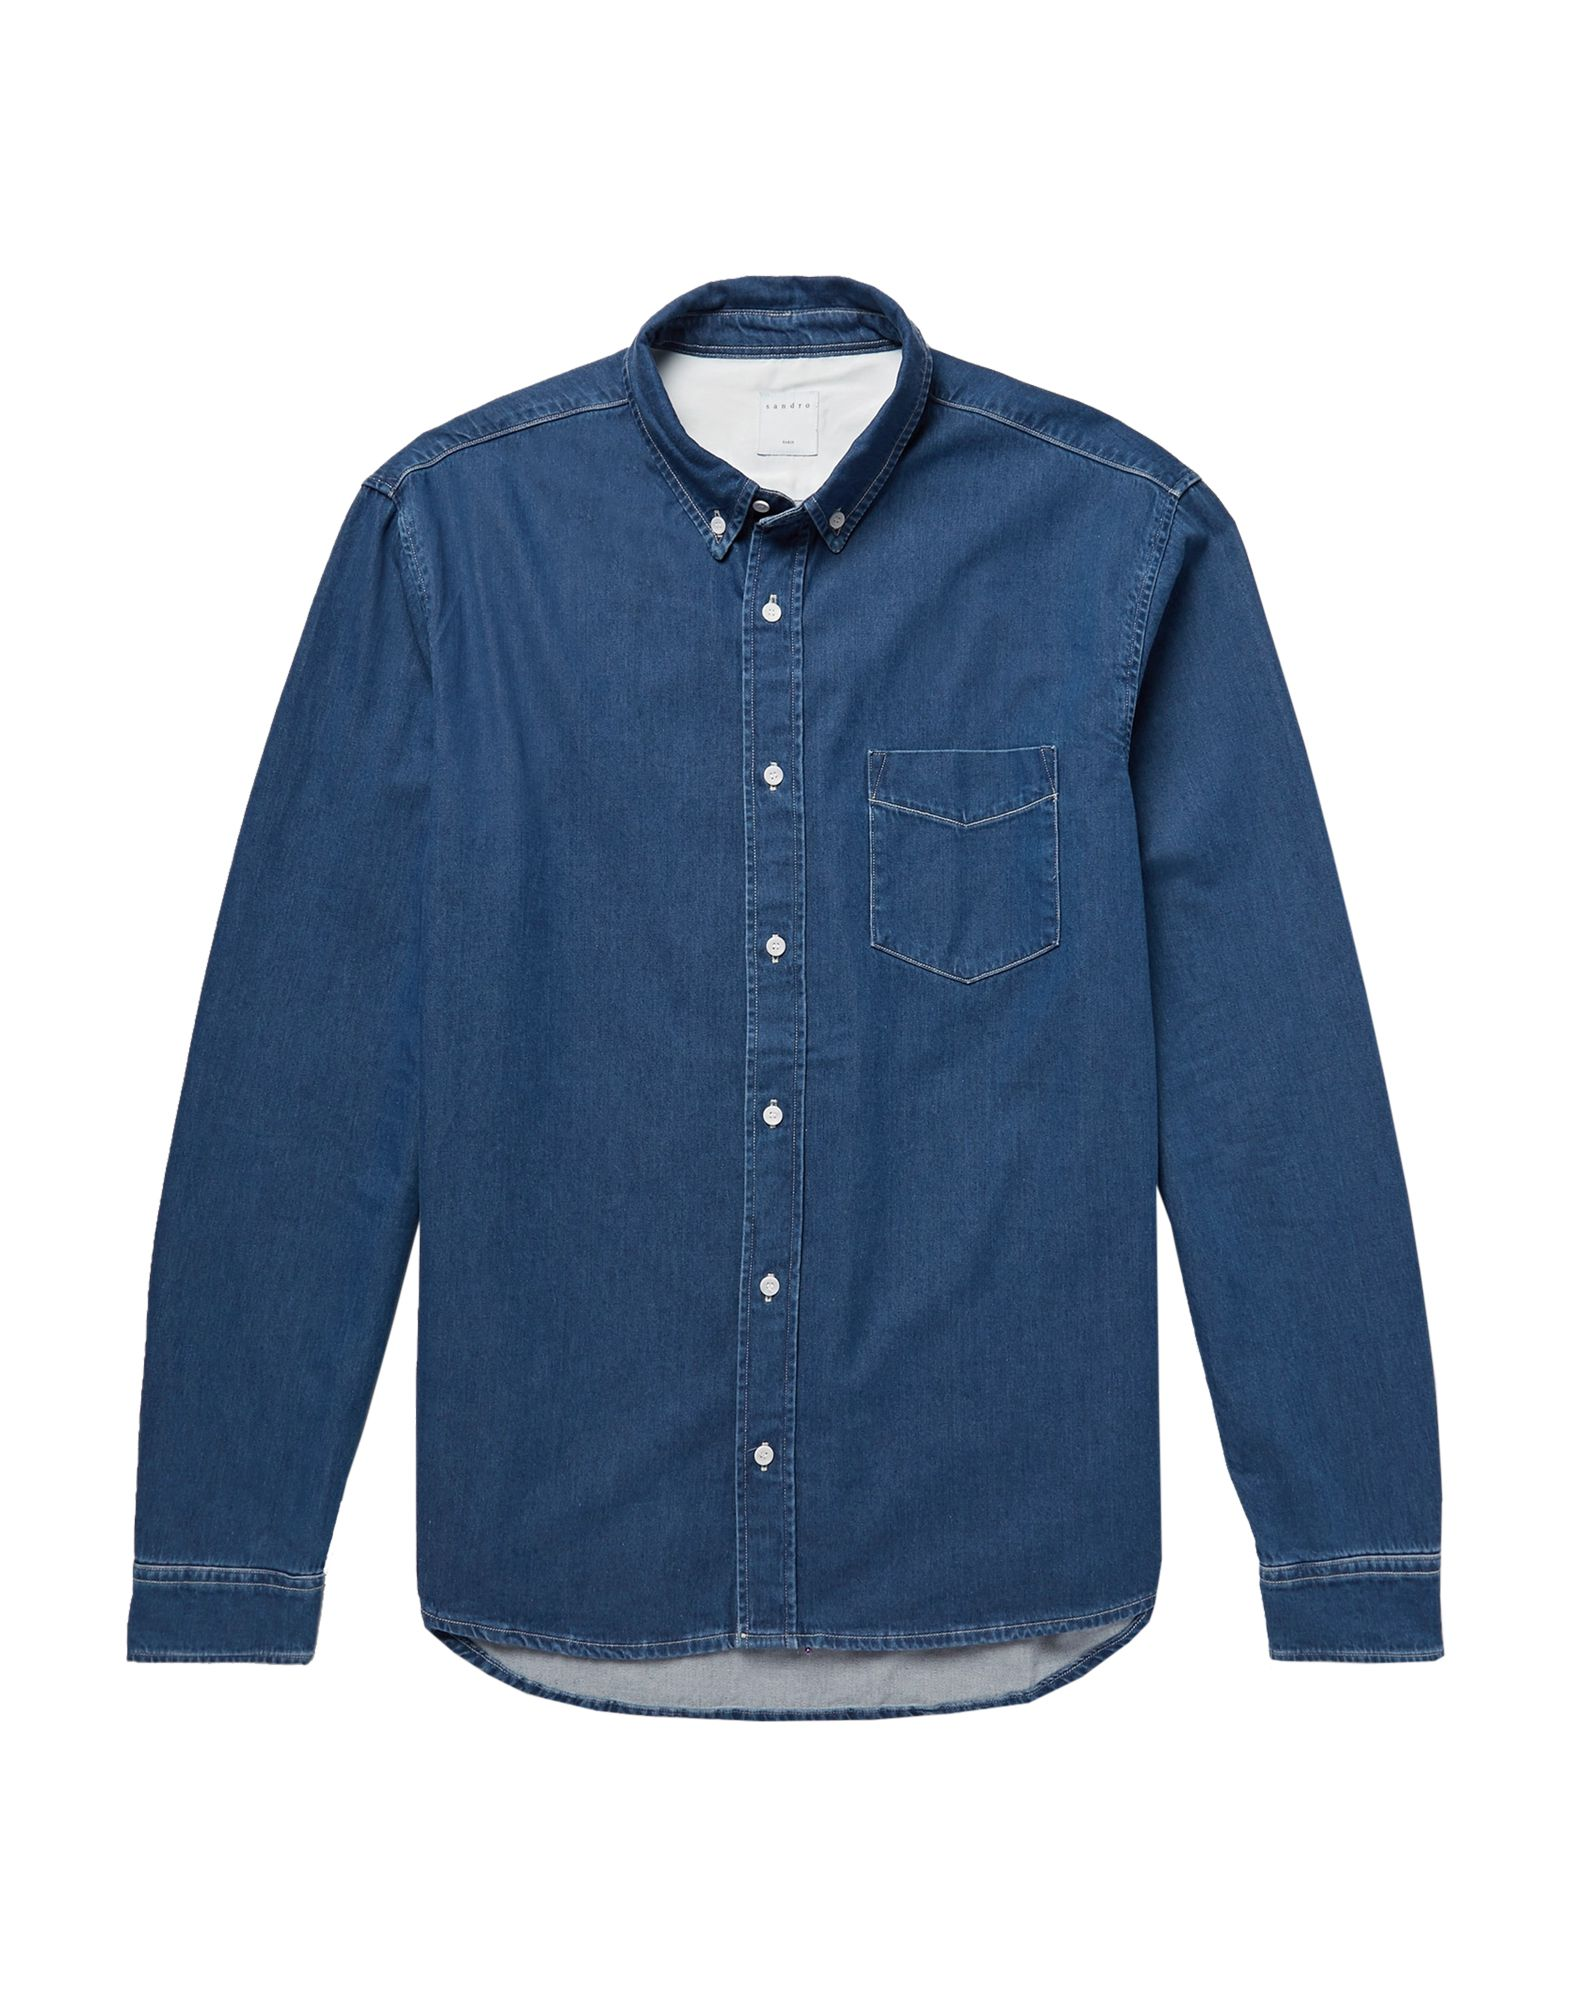 Фото - SANDRO Джинсовая рубашка sandro джинсовая юбка